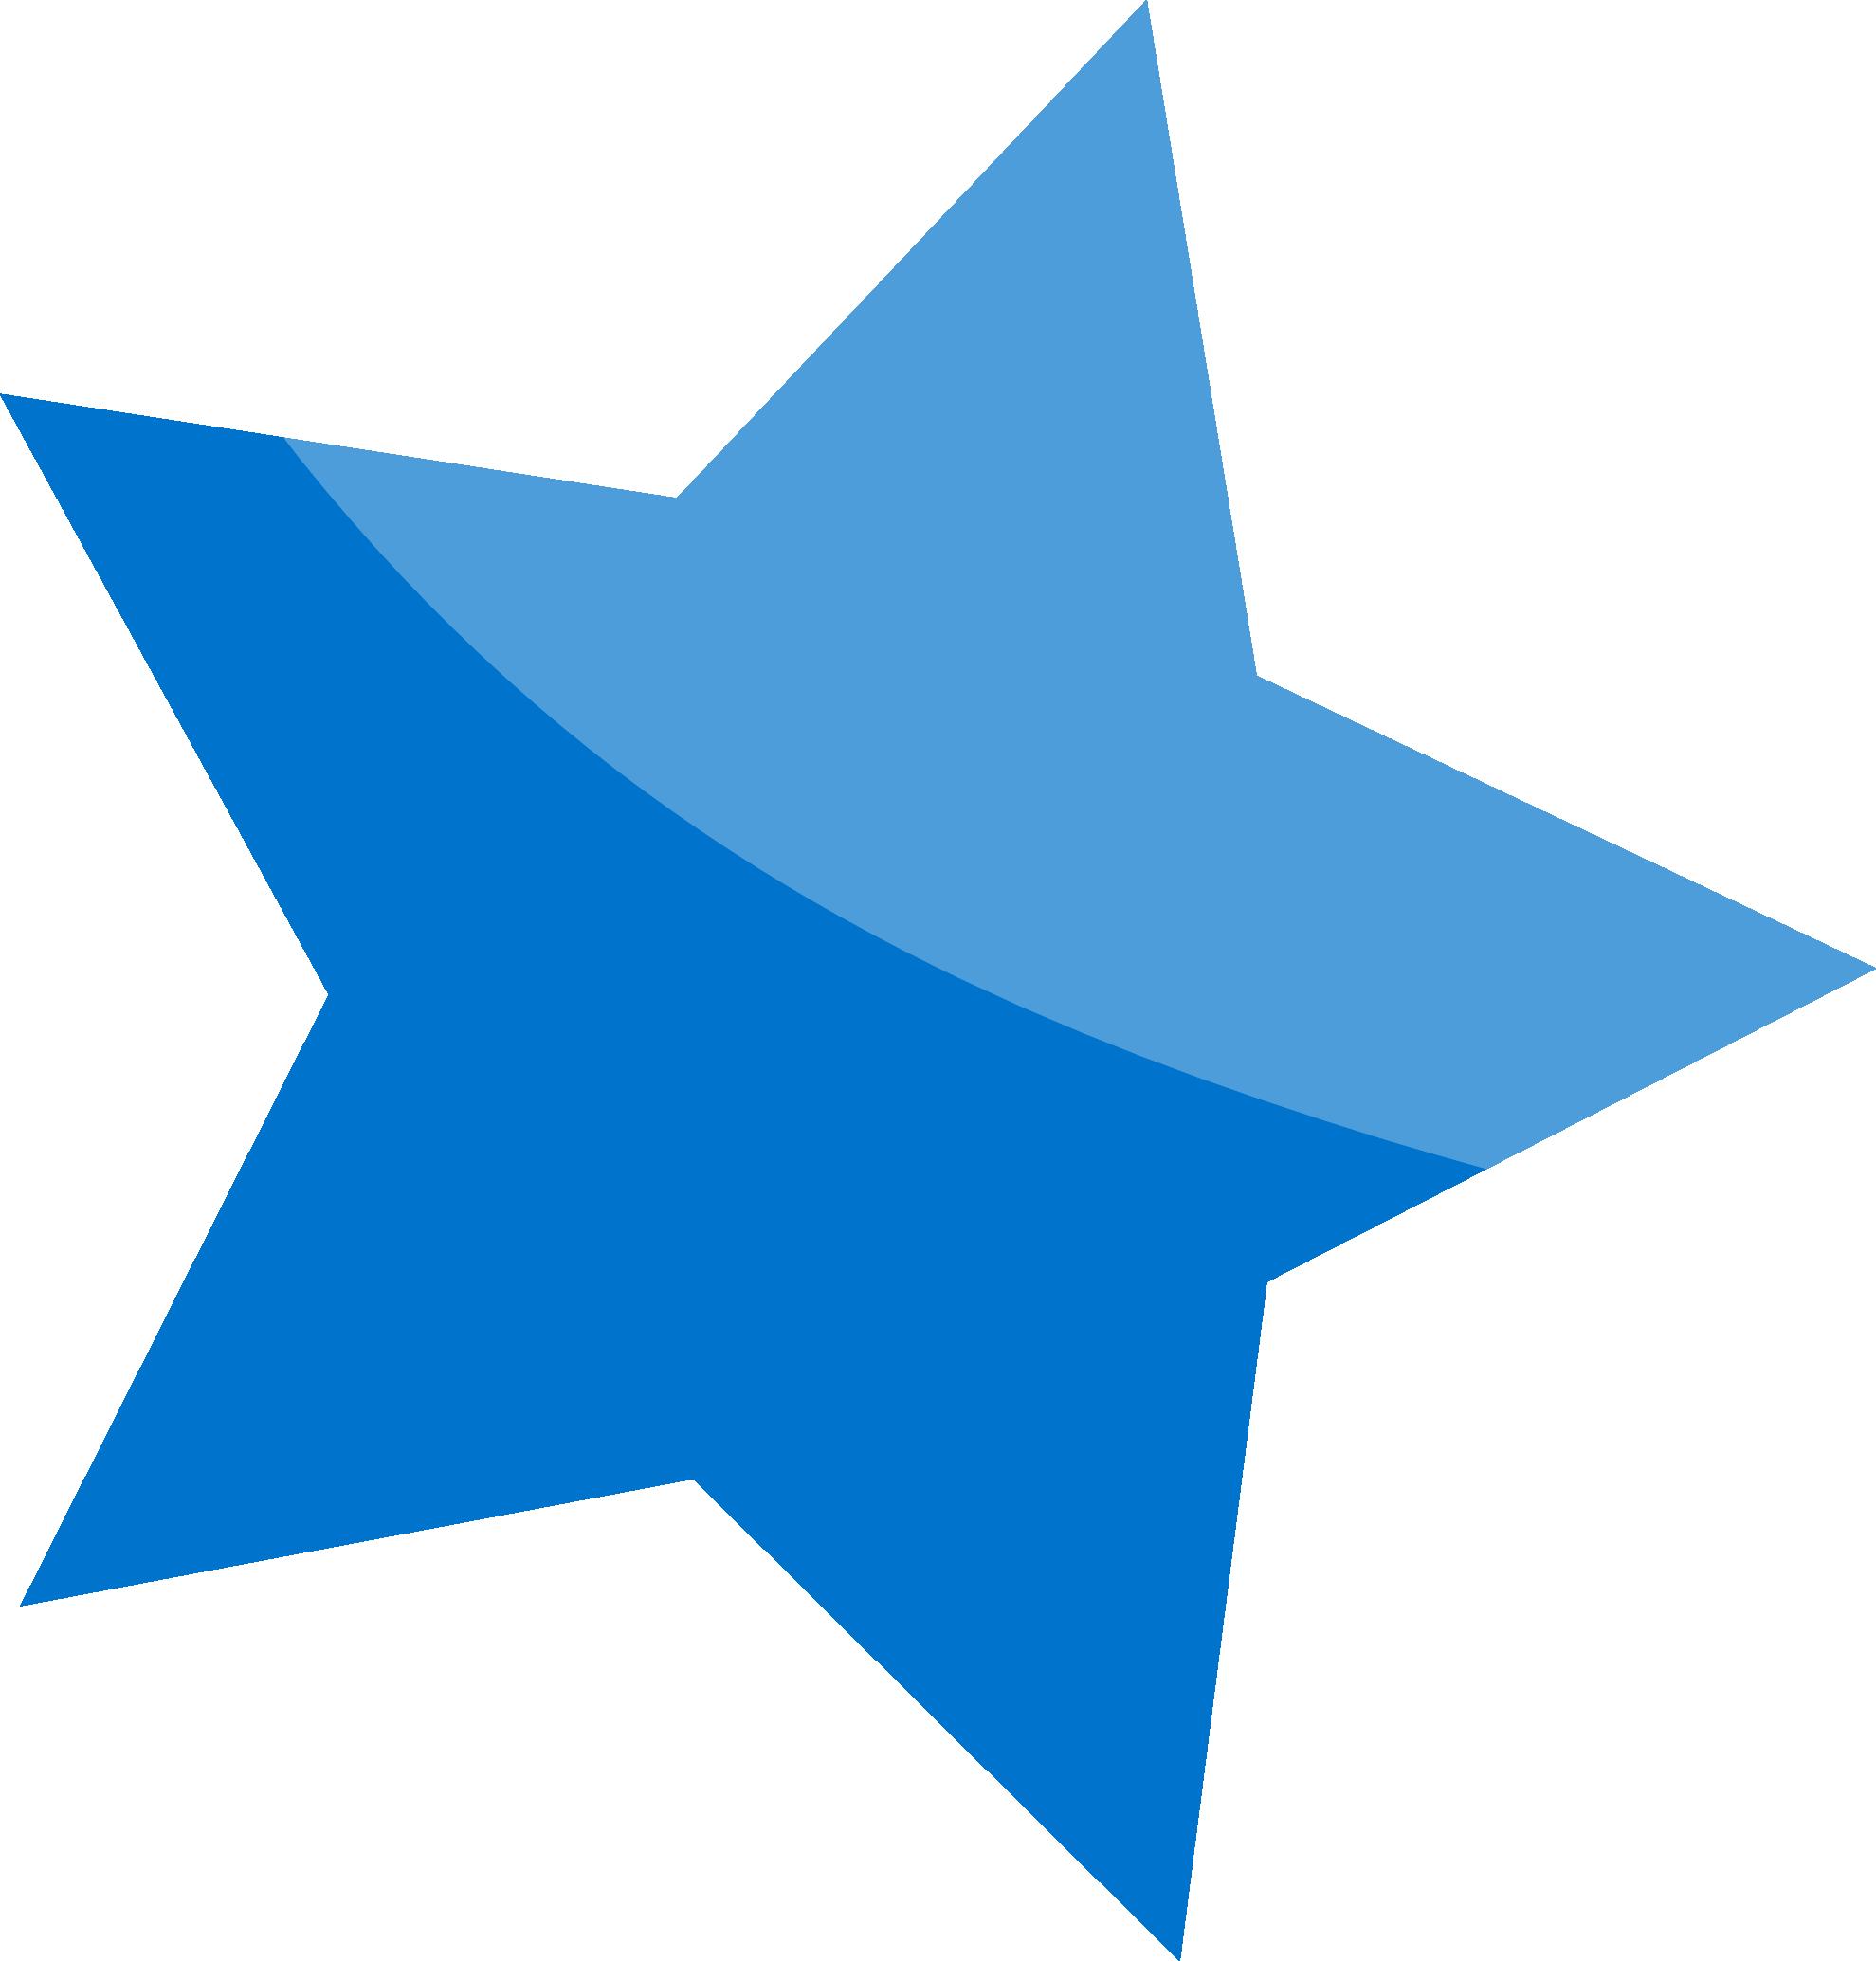 Blue Star Png Image Transparent Background Free Download.